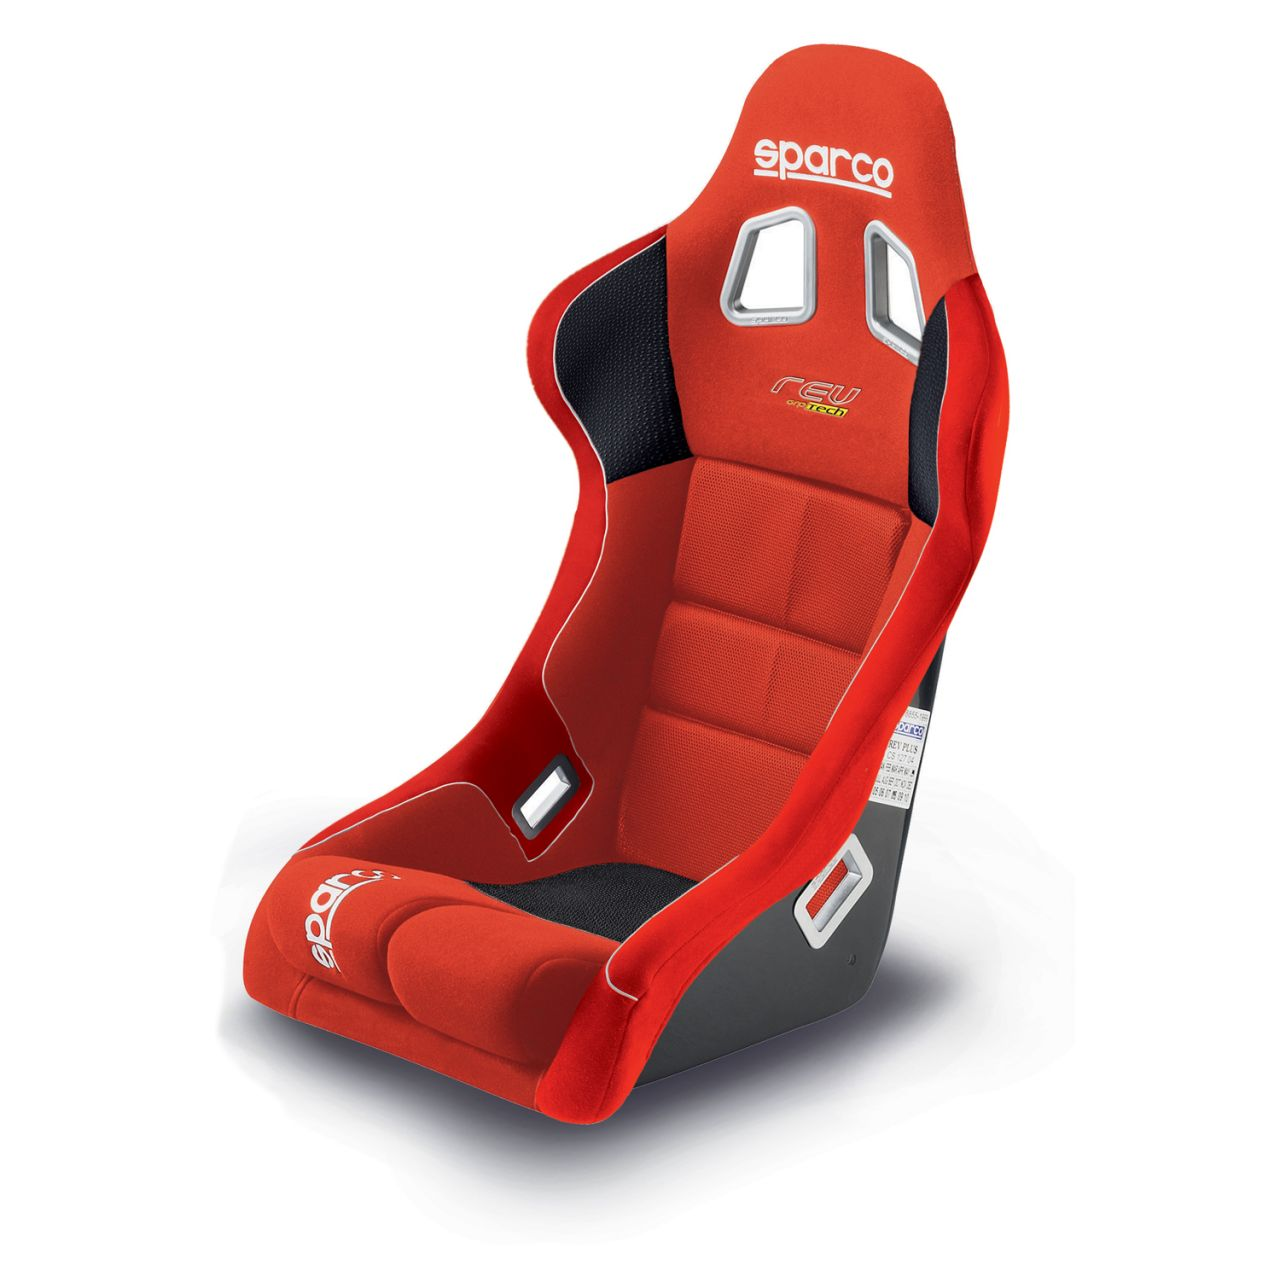 Sparco Racing Seats